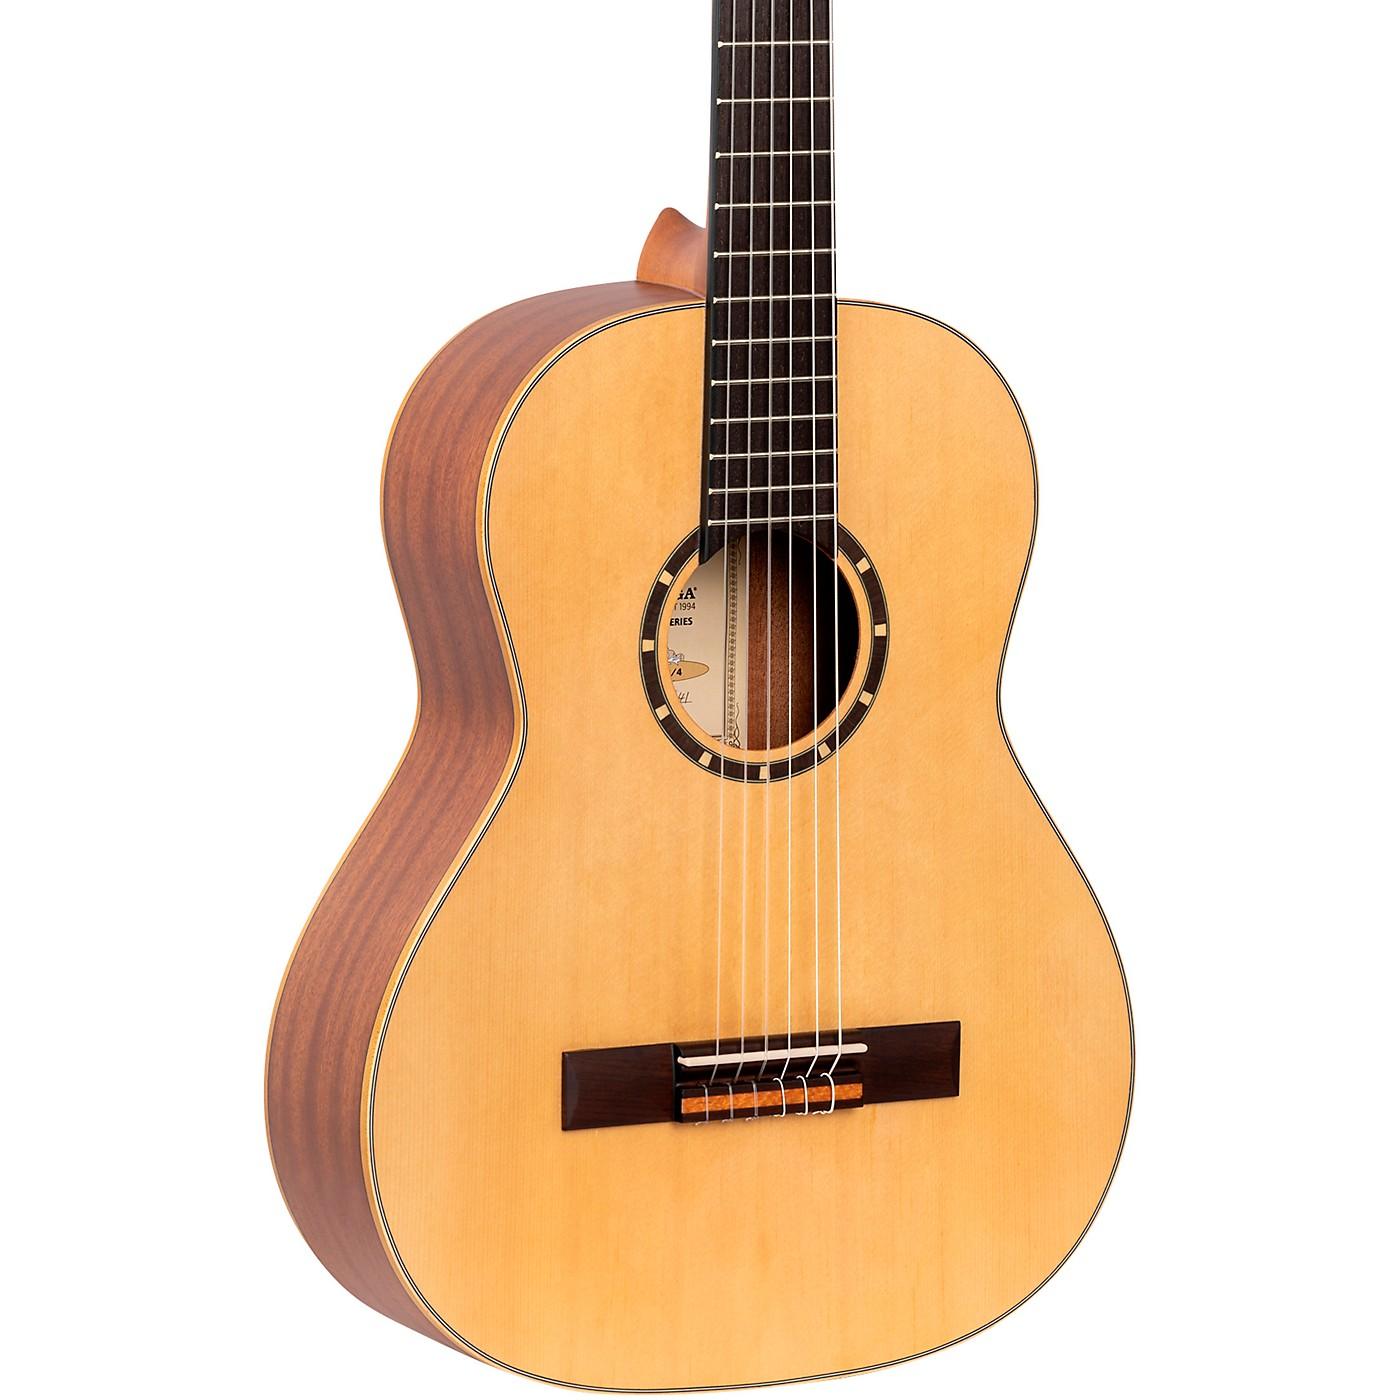 Ortega Family Series R121L-1/2 Classical Guitar thumbnail